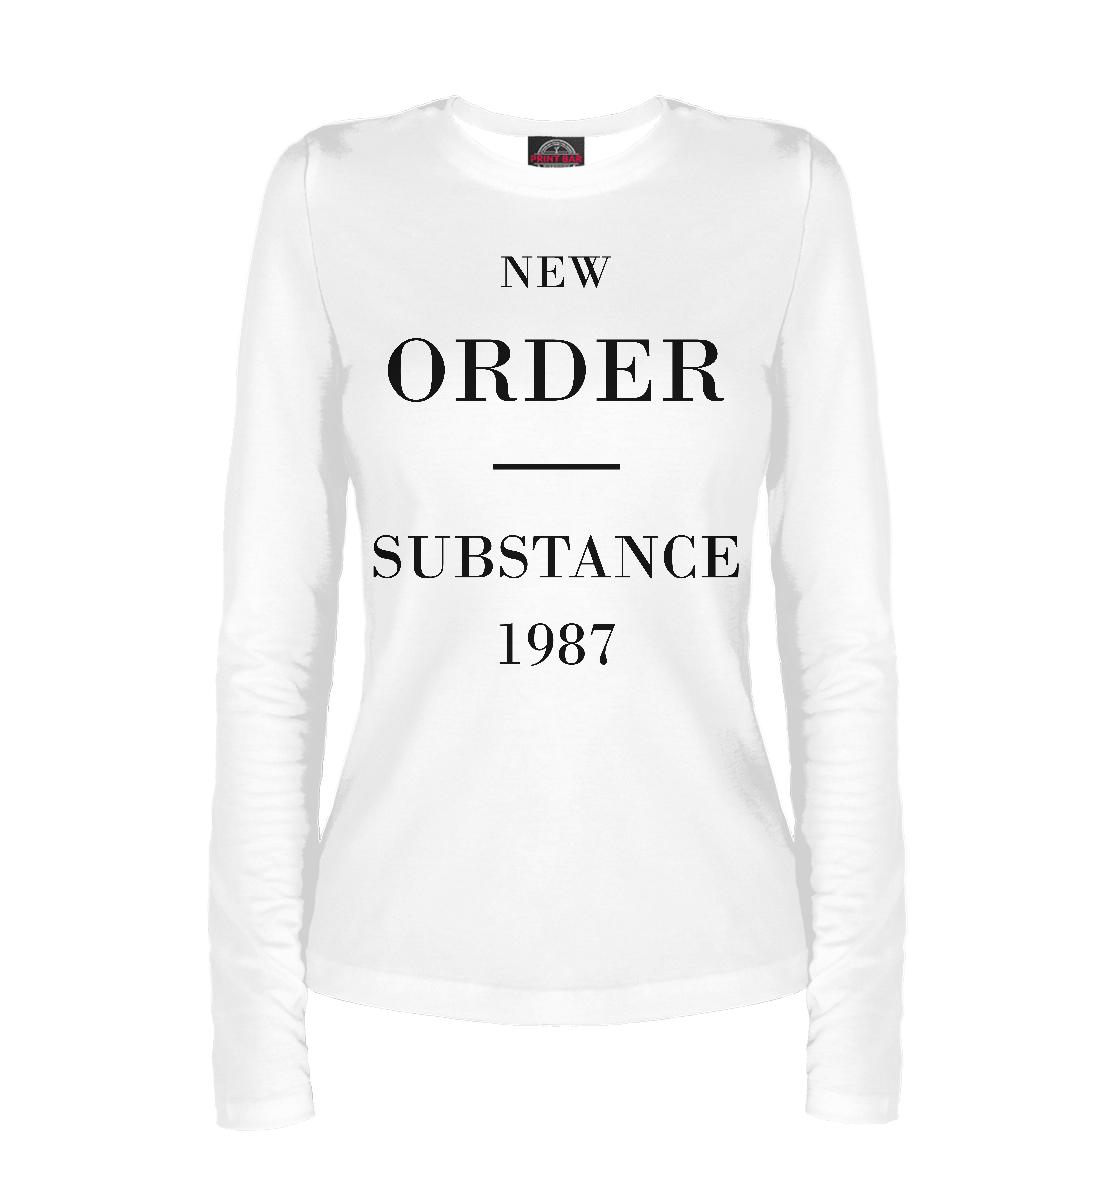 Фото - New Order sean fay wolfe new order